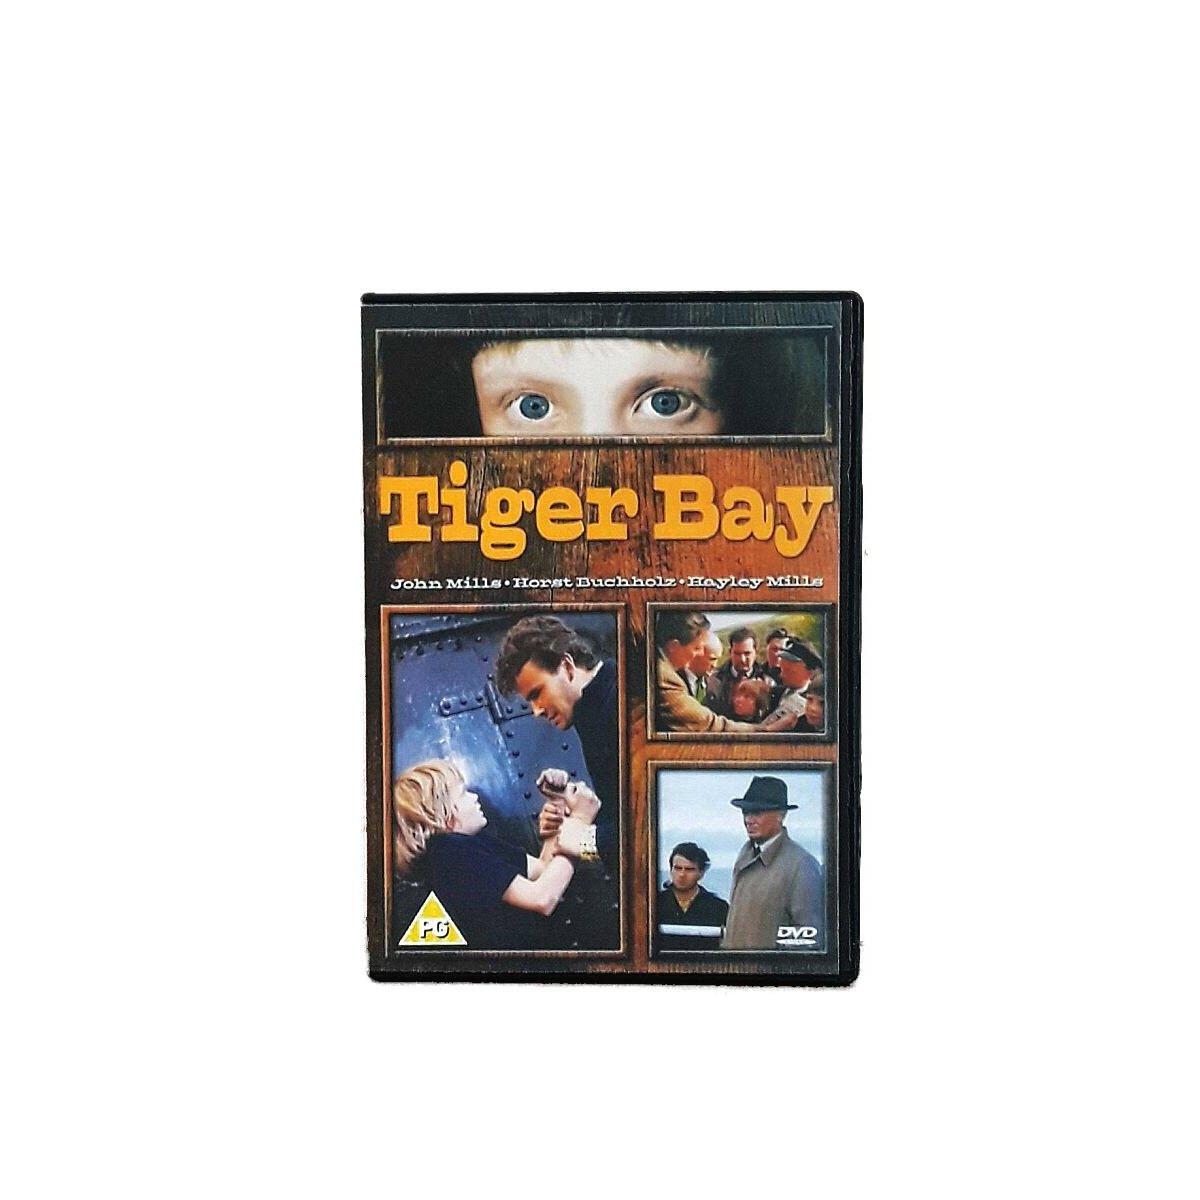 Tiger Bay 1959 Hayley Mills Thriller Crime Drama